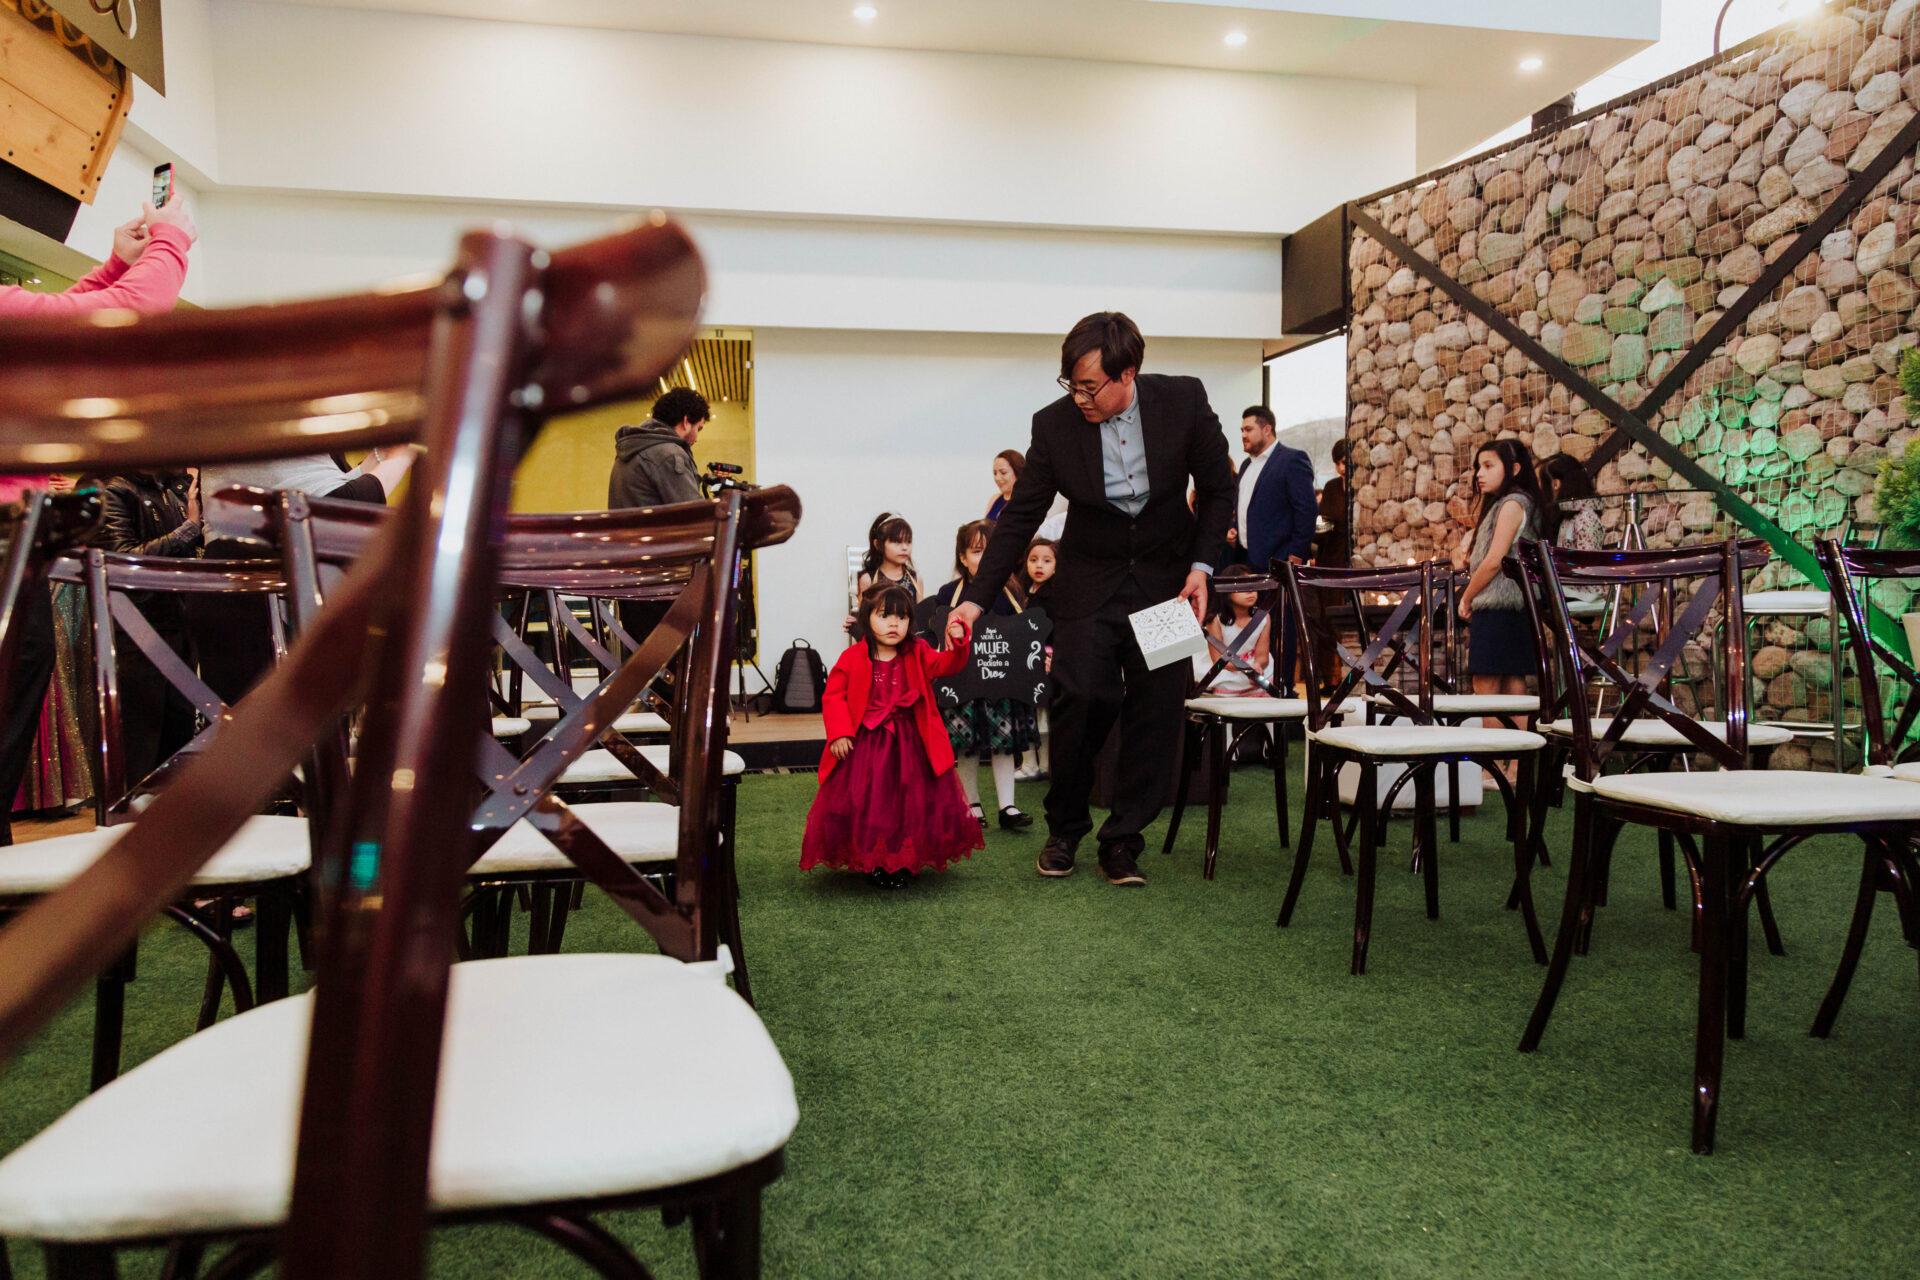 javier_noriega_fotografo_bodas_gaviones_zacatecas_wedding_photographer23